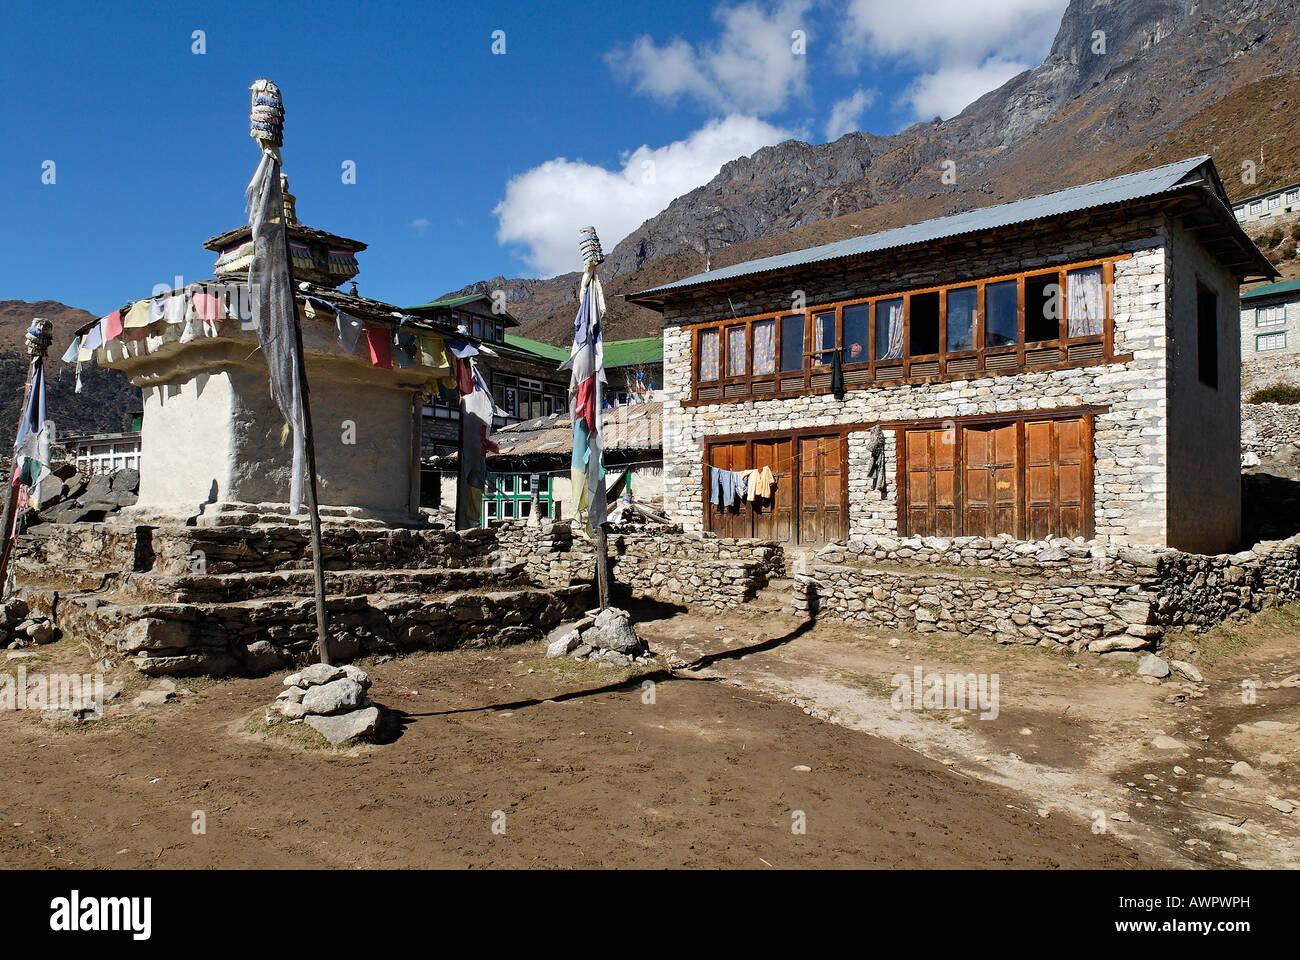 Stupa and Trekking Lodge at Khumjung Sherpa village, Sagarmatha National Park, Khumbu, Nepal - Stock Image